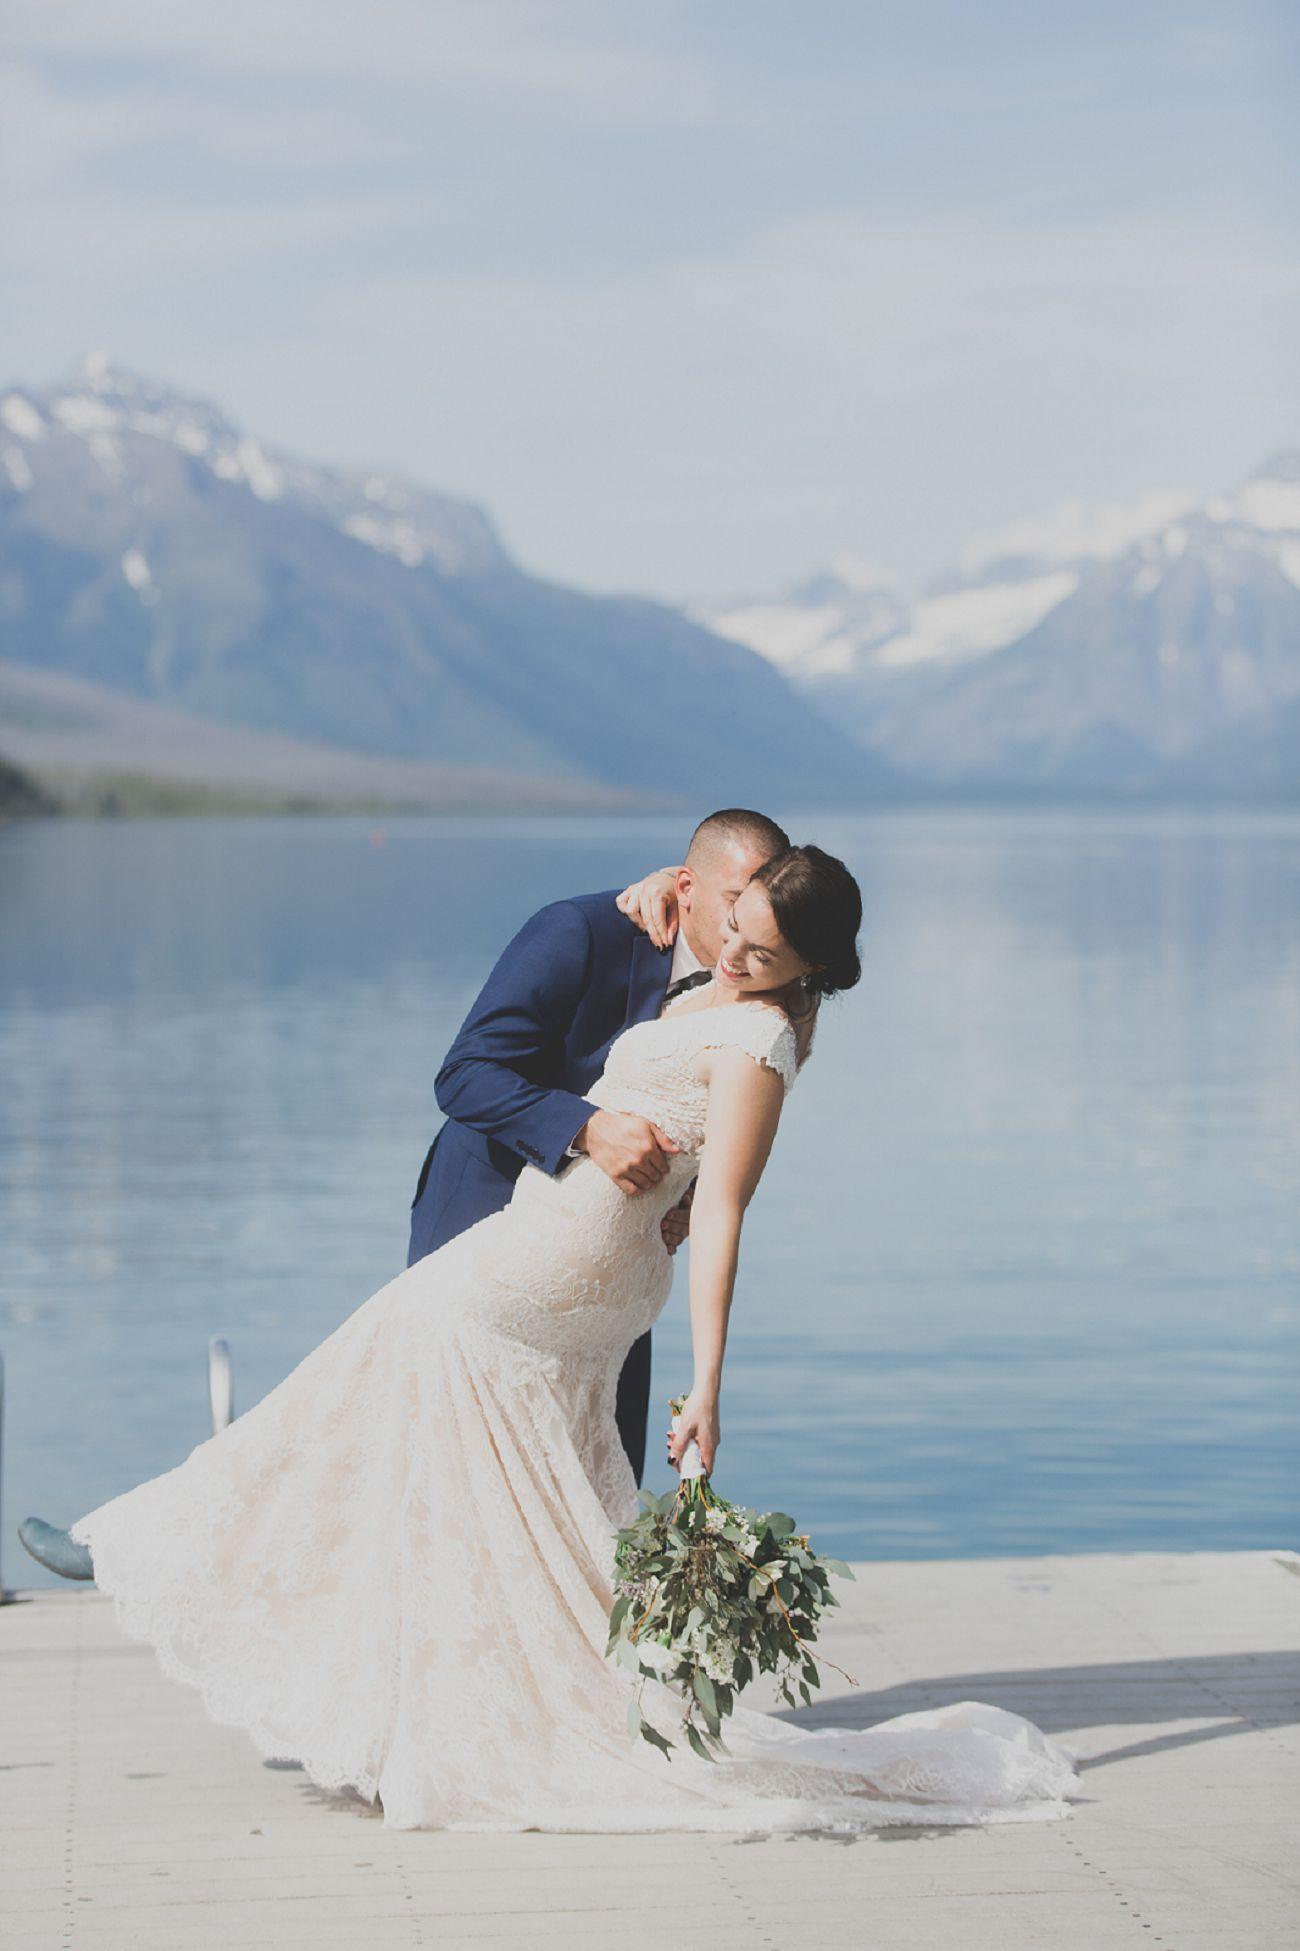 Jennifer_Mooney_Photo_Glacier_Park_Weddings_Elopement_00062.jpg